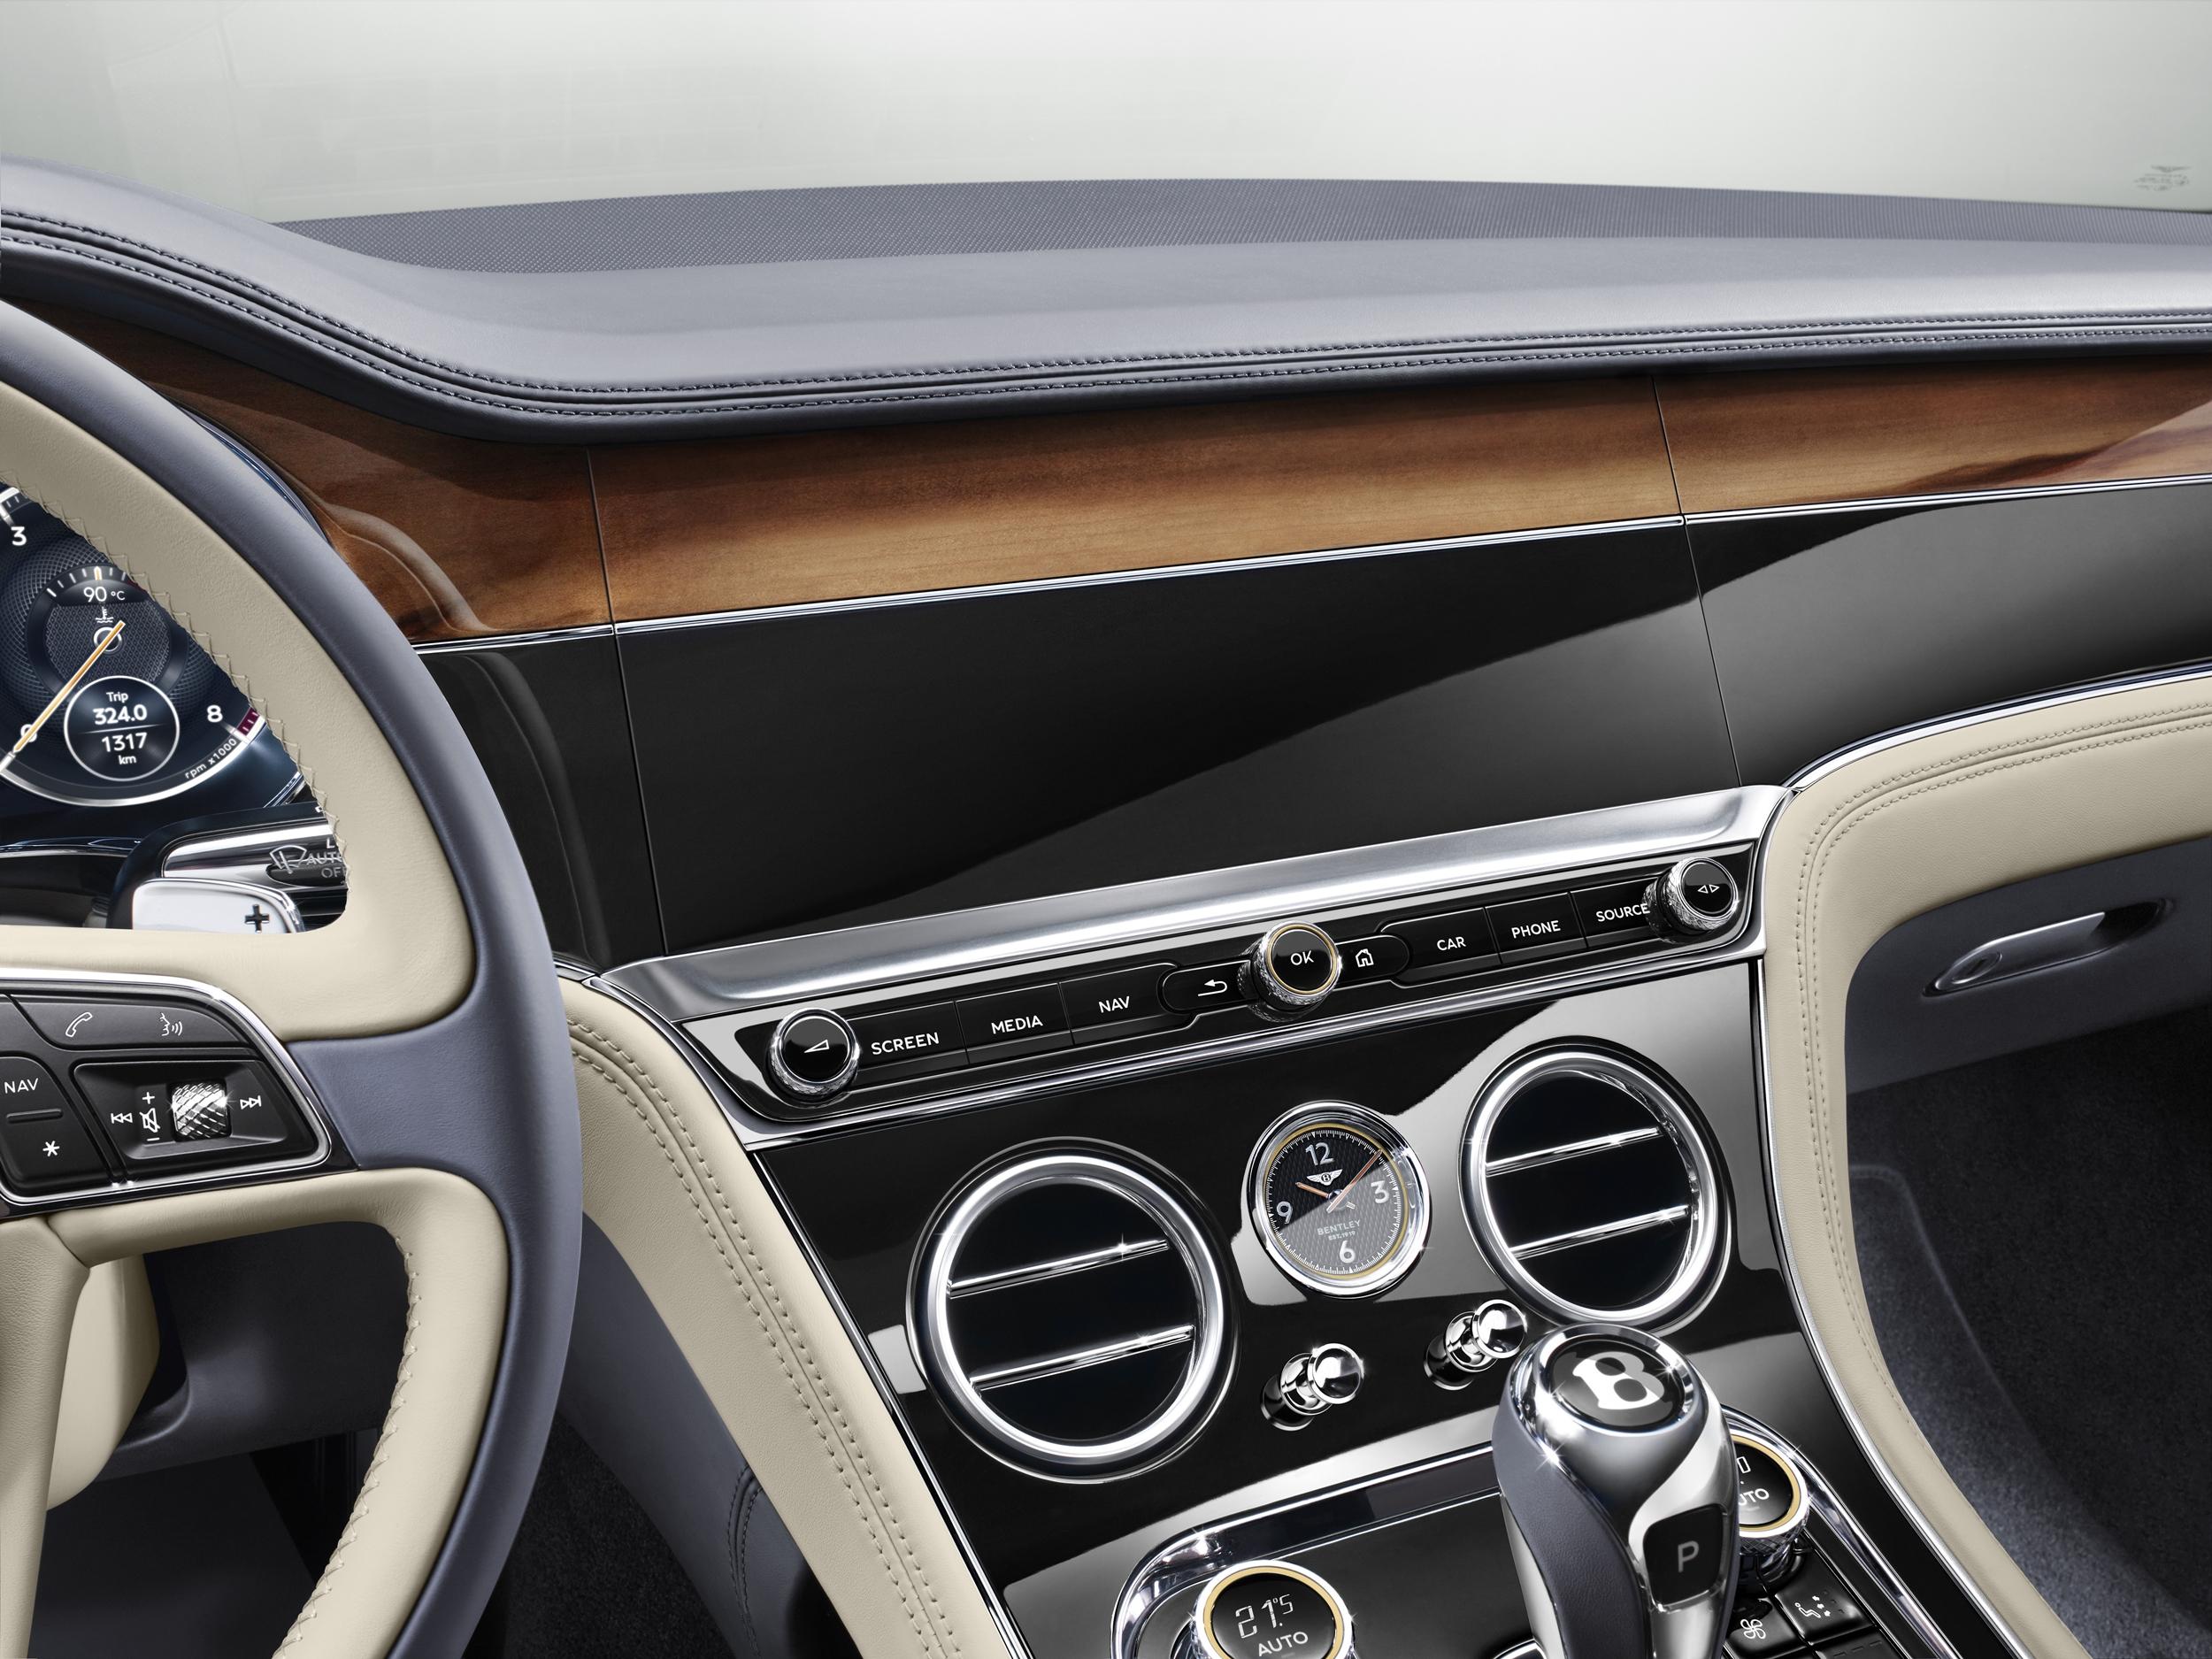 Bentley Continental GT dashboard design